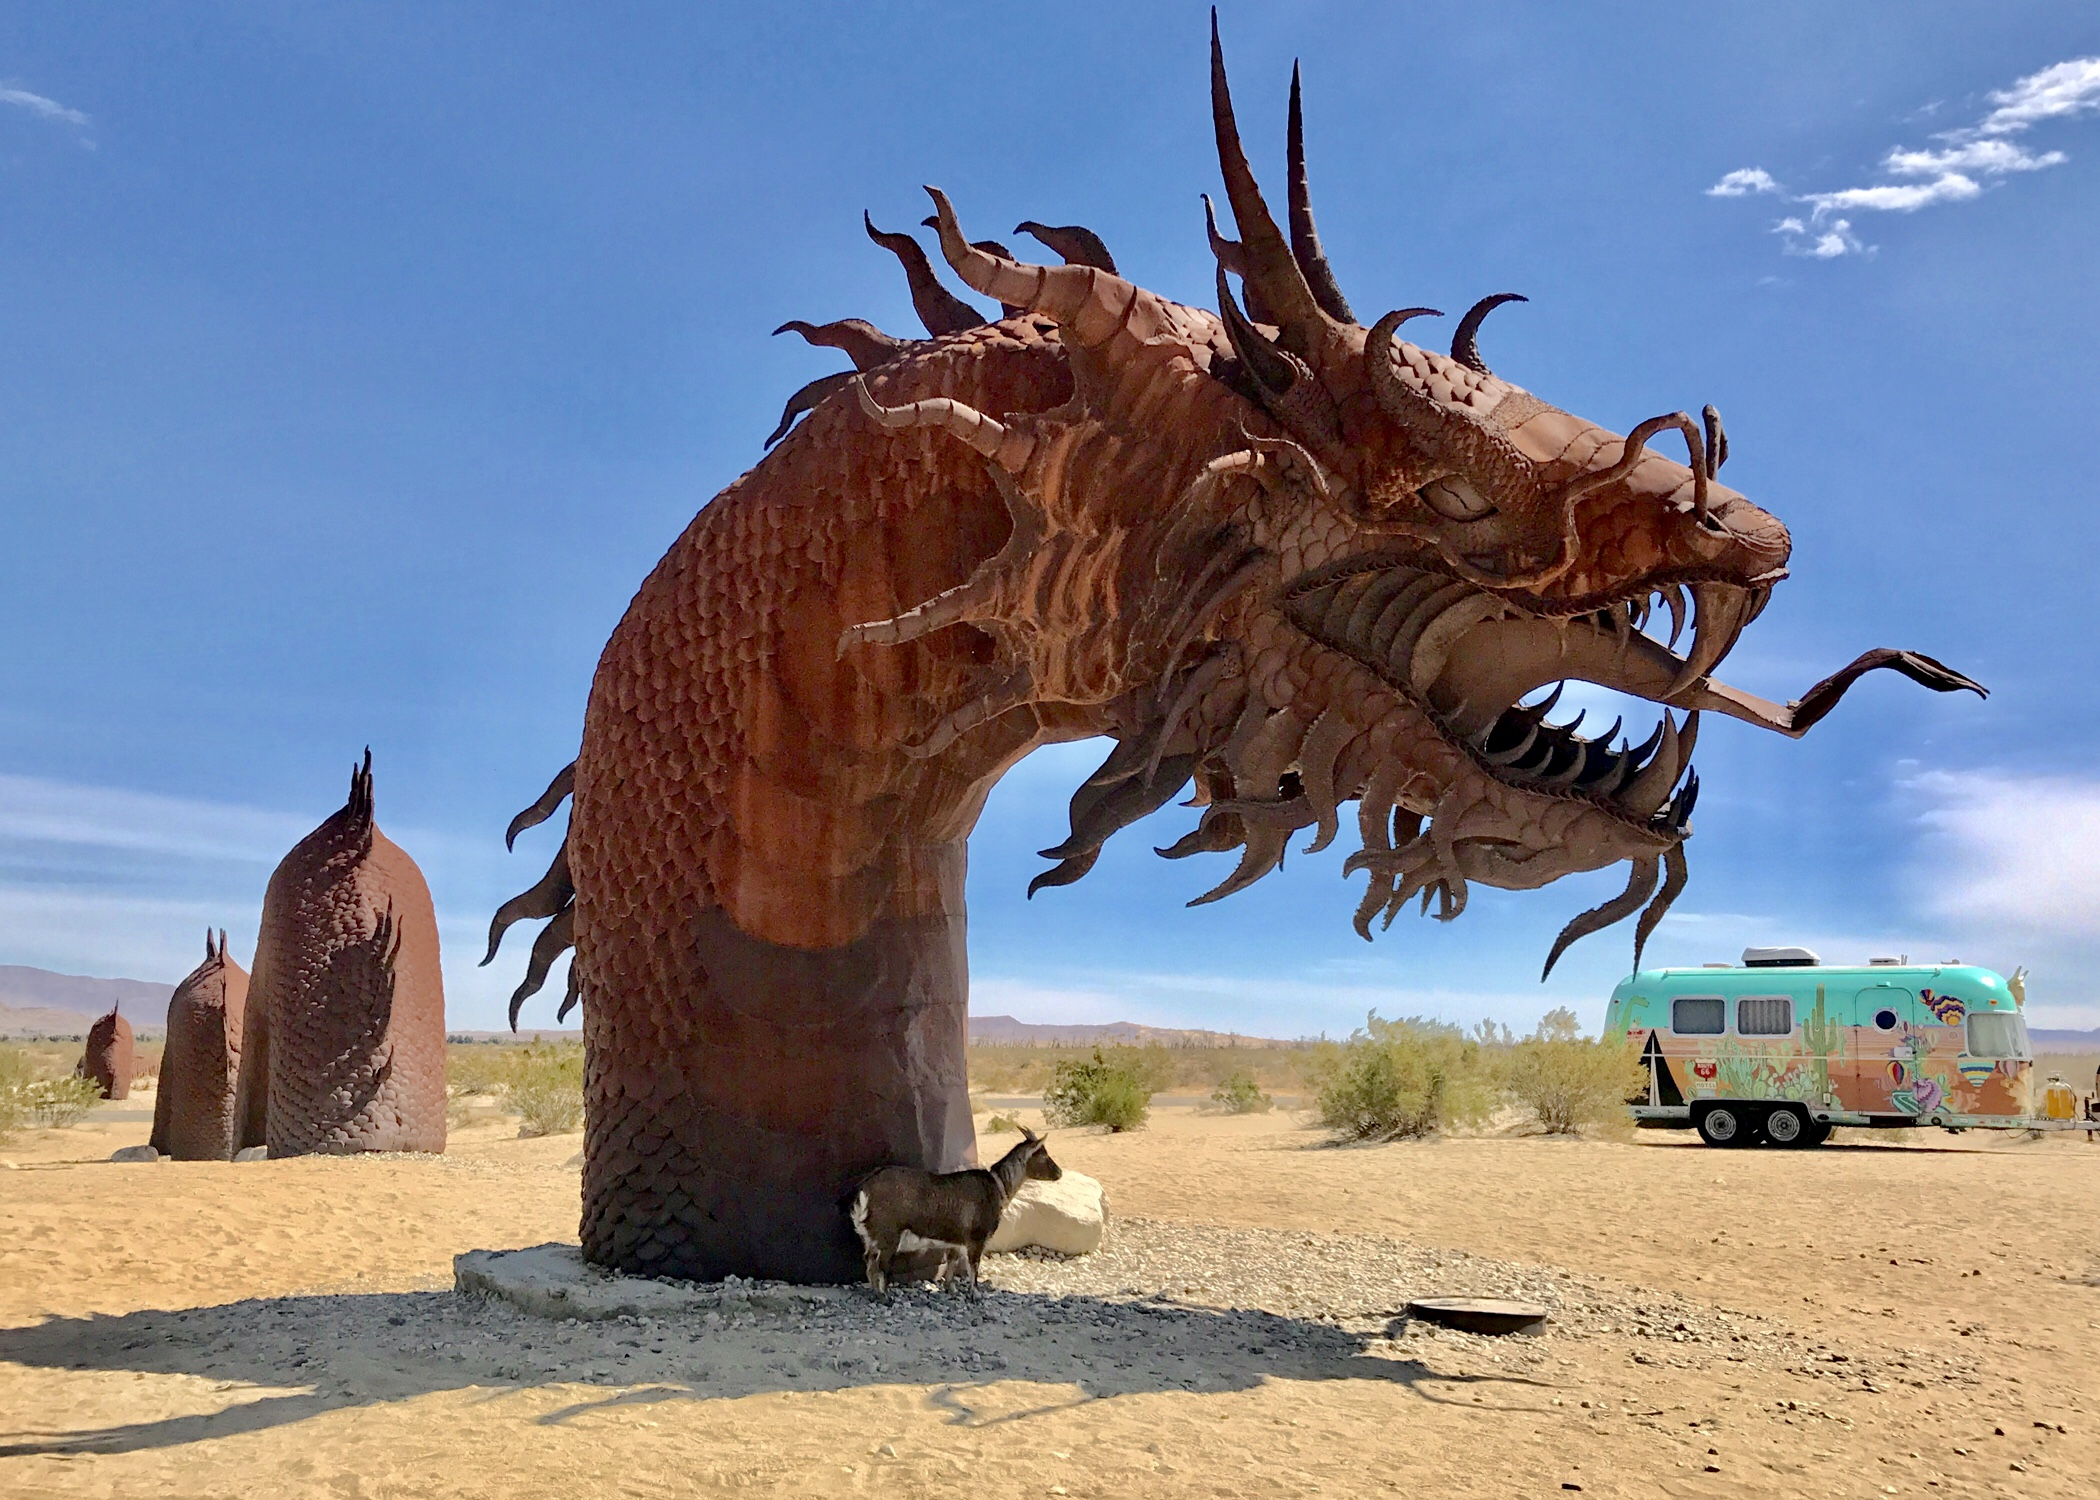 Dragon metal art in Anza Borrego desert with trailer in background